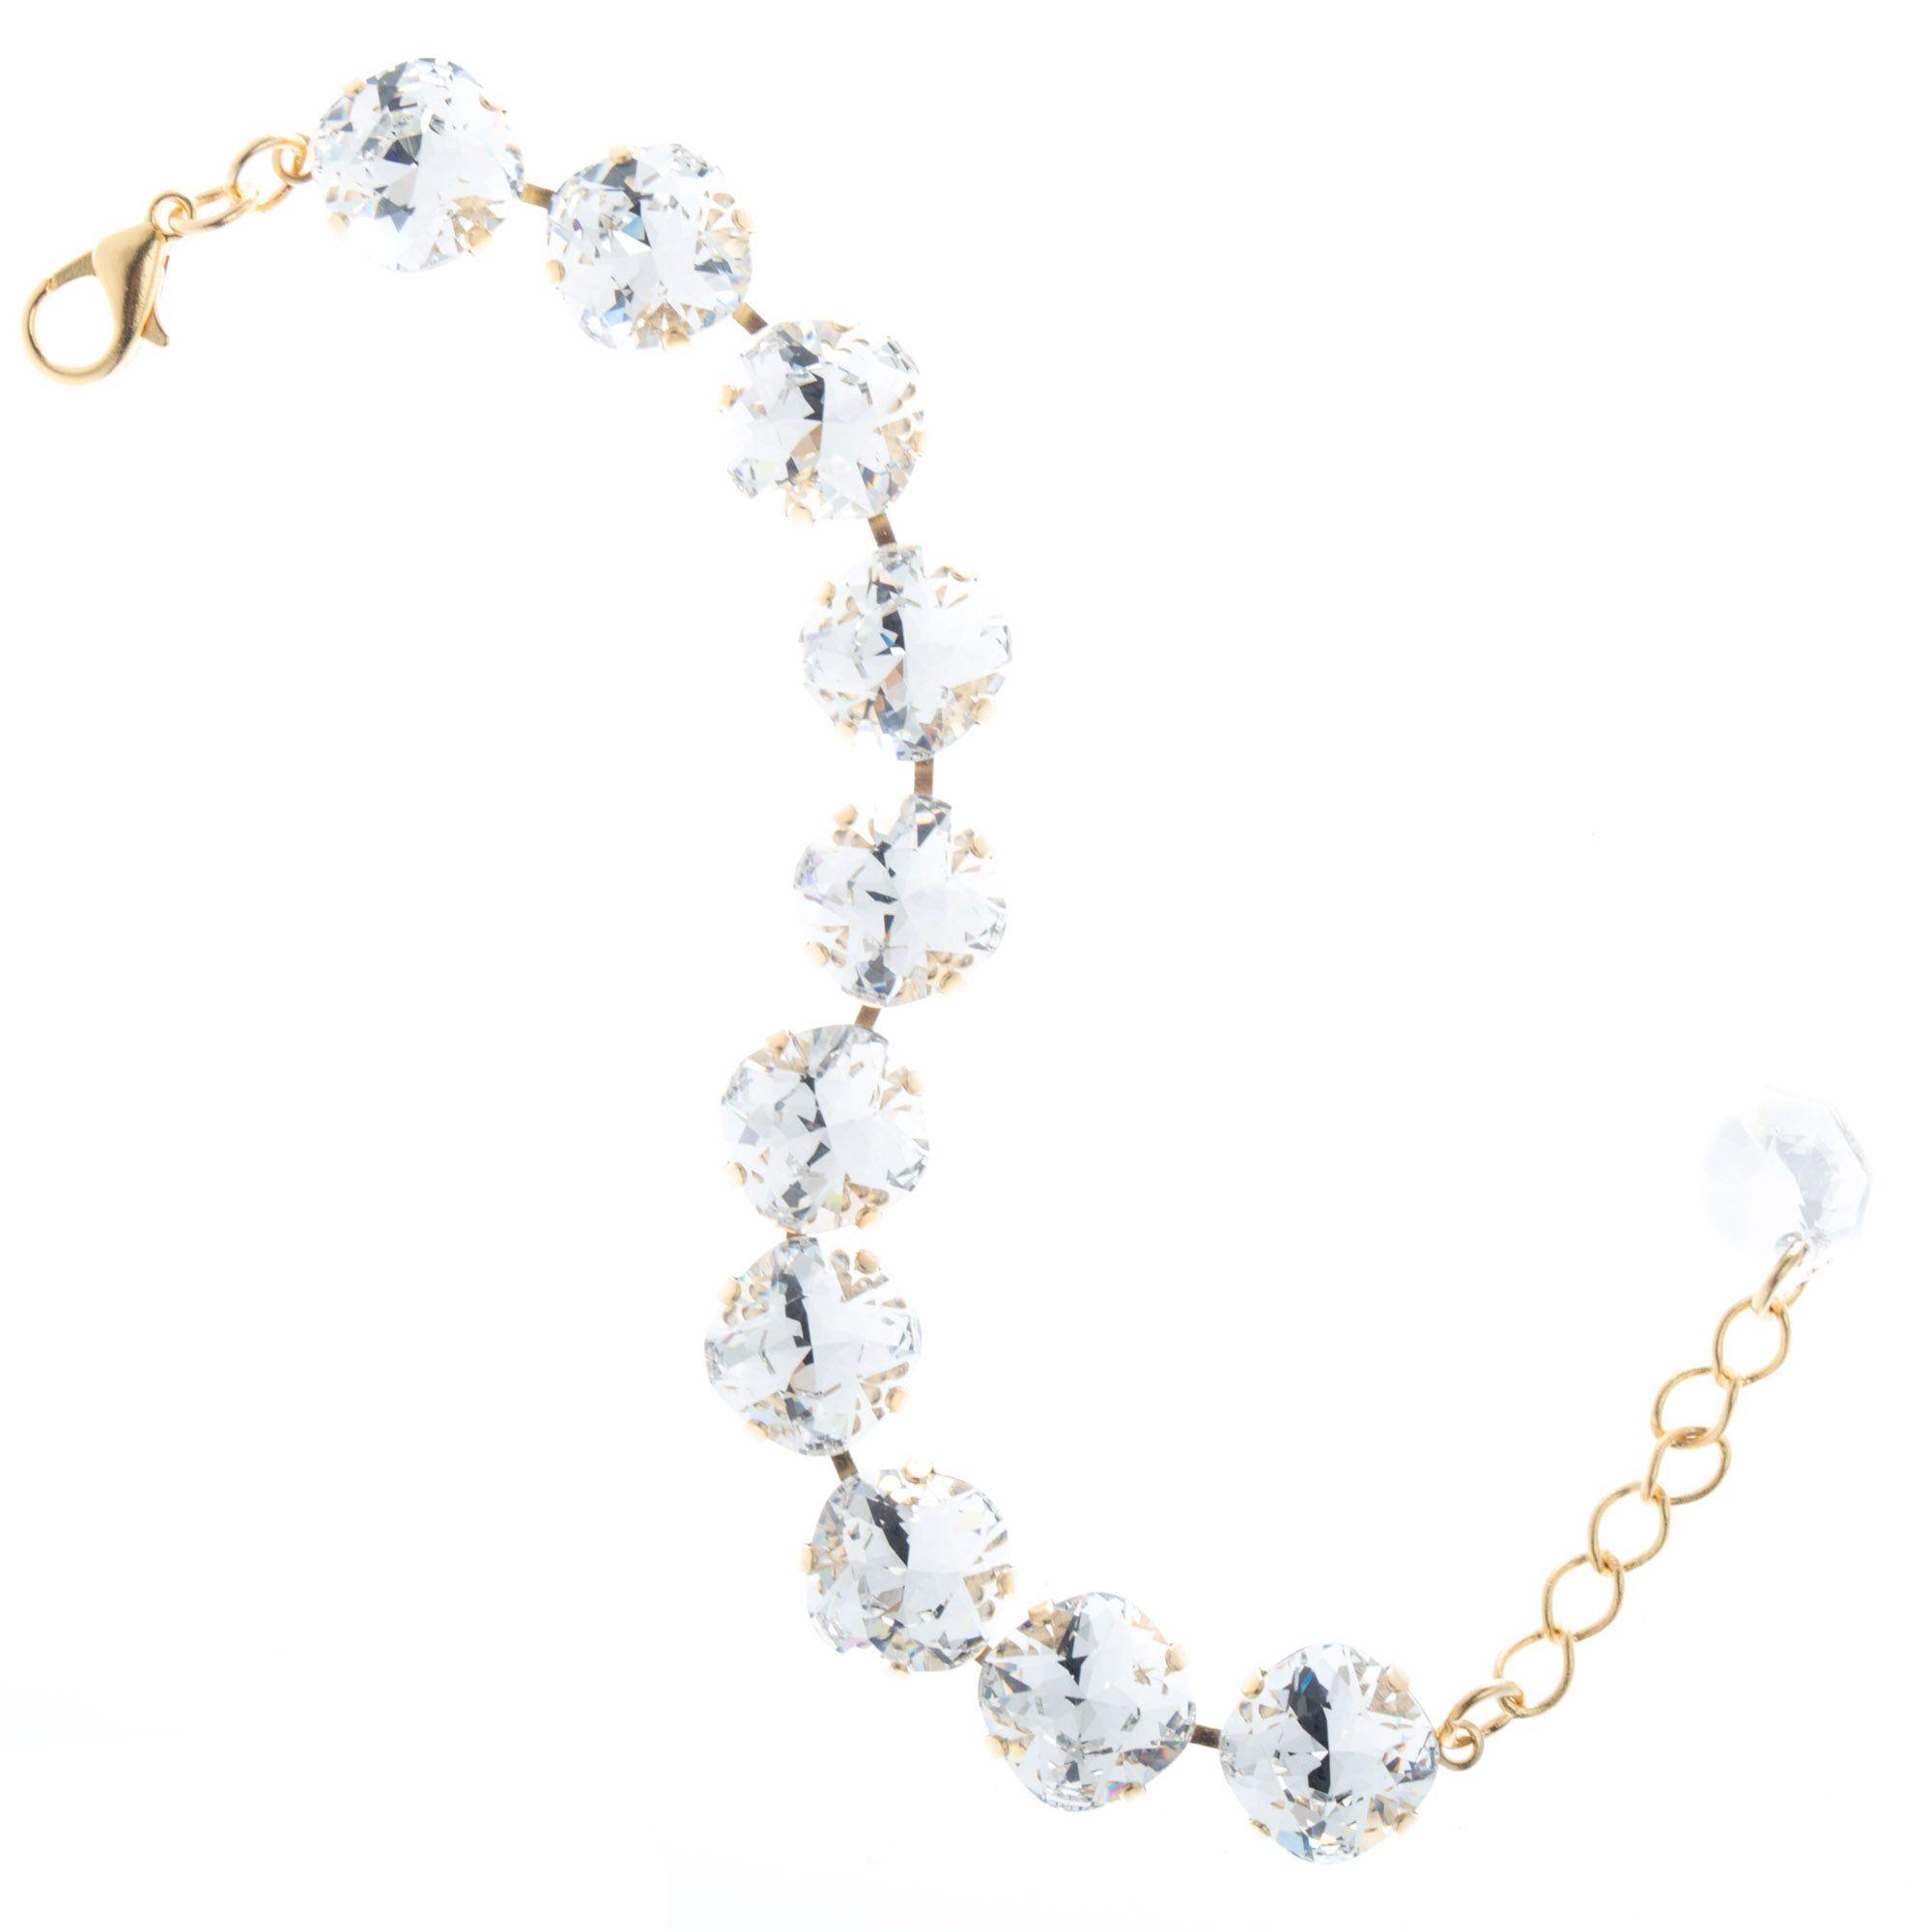 c91bf717fff025 Lisa Marie Jewelry 12mm Square Swarovski Crystal Bracelet - Clear